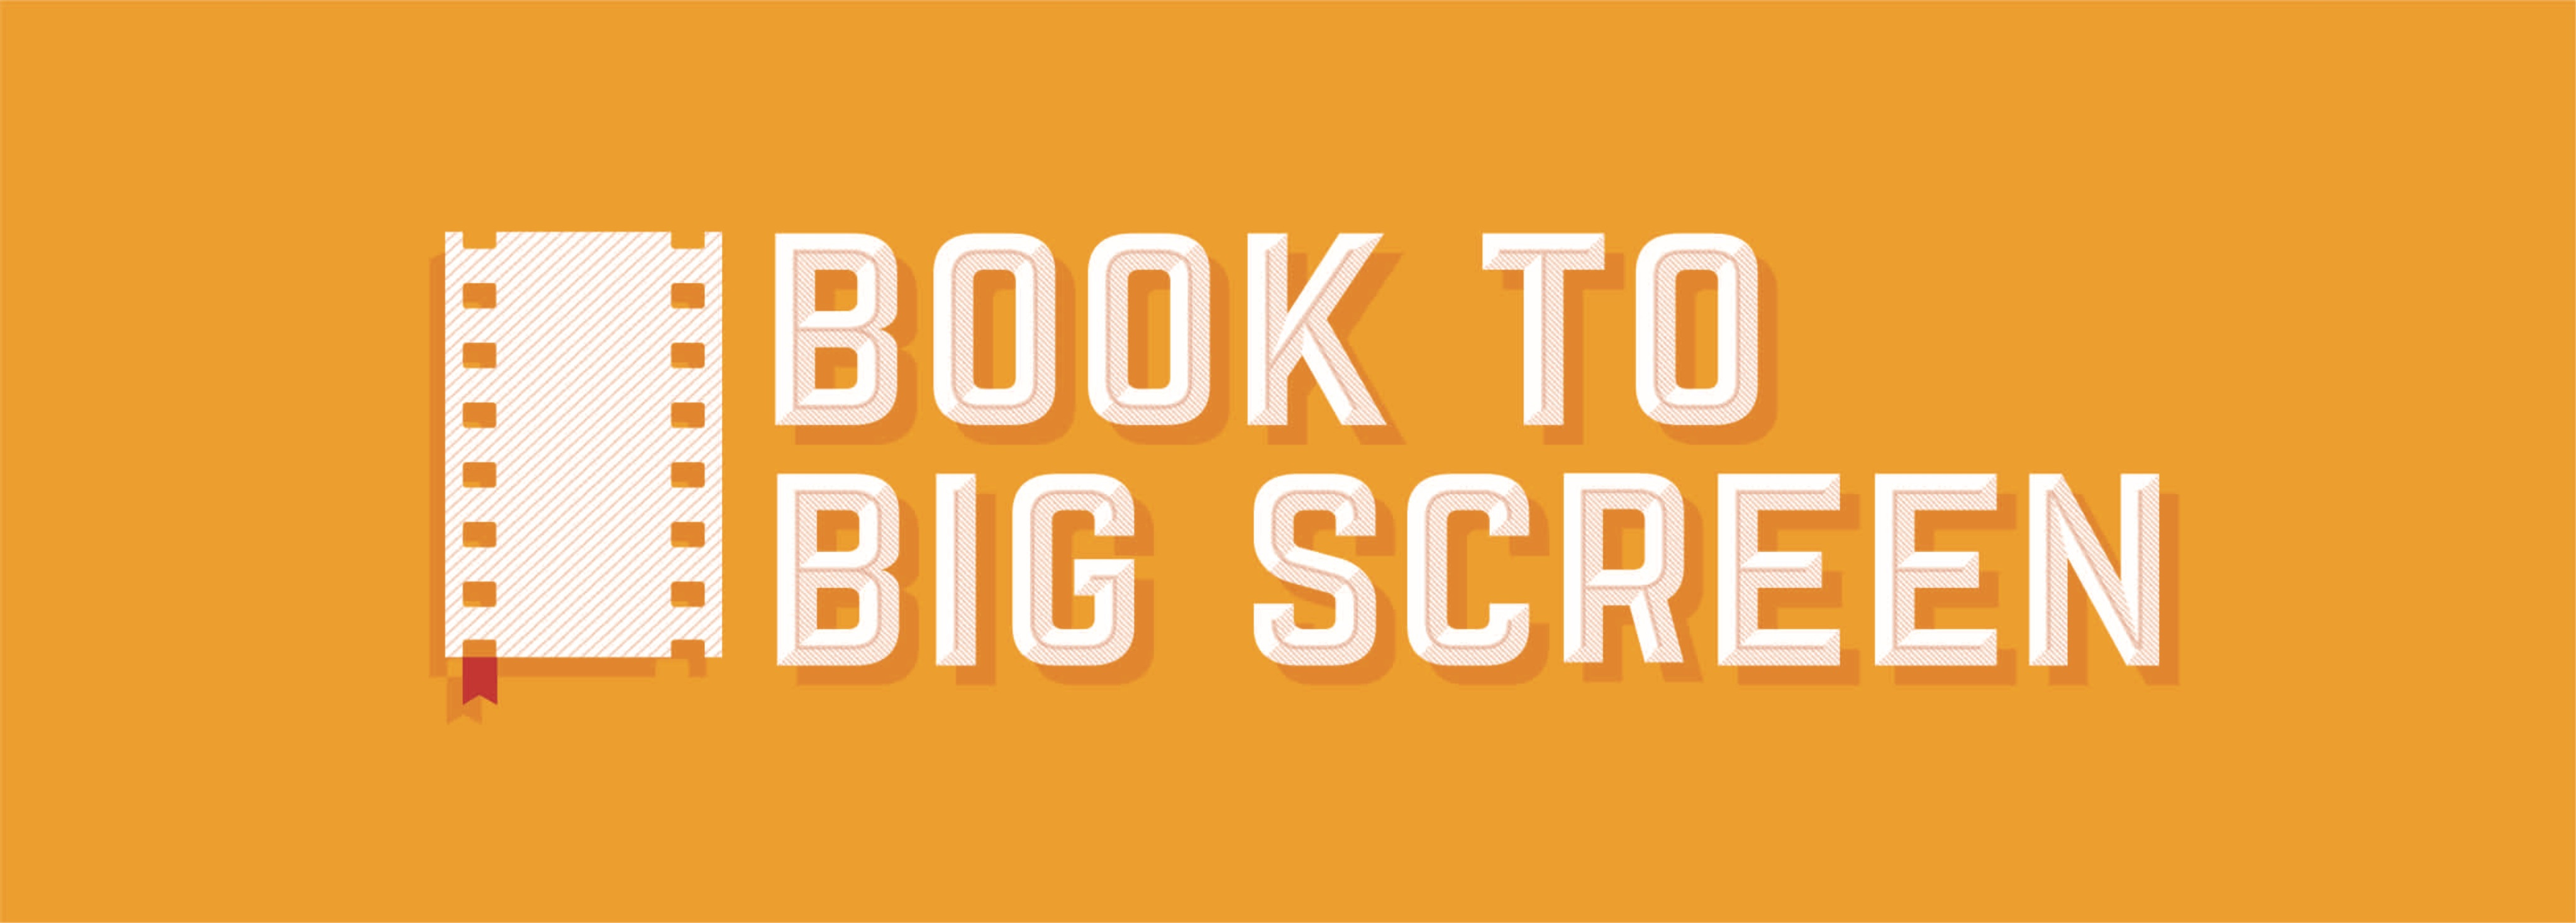 Book to Big Screen